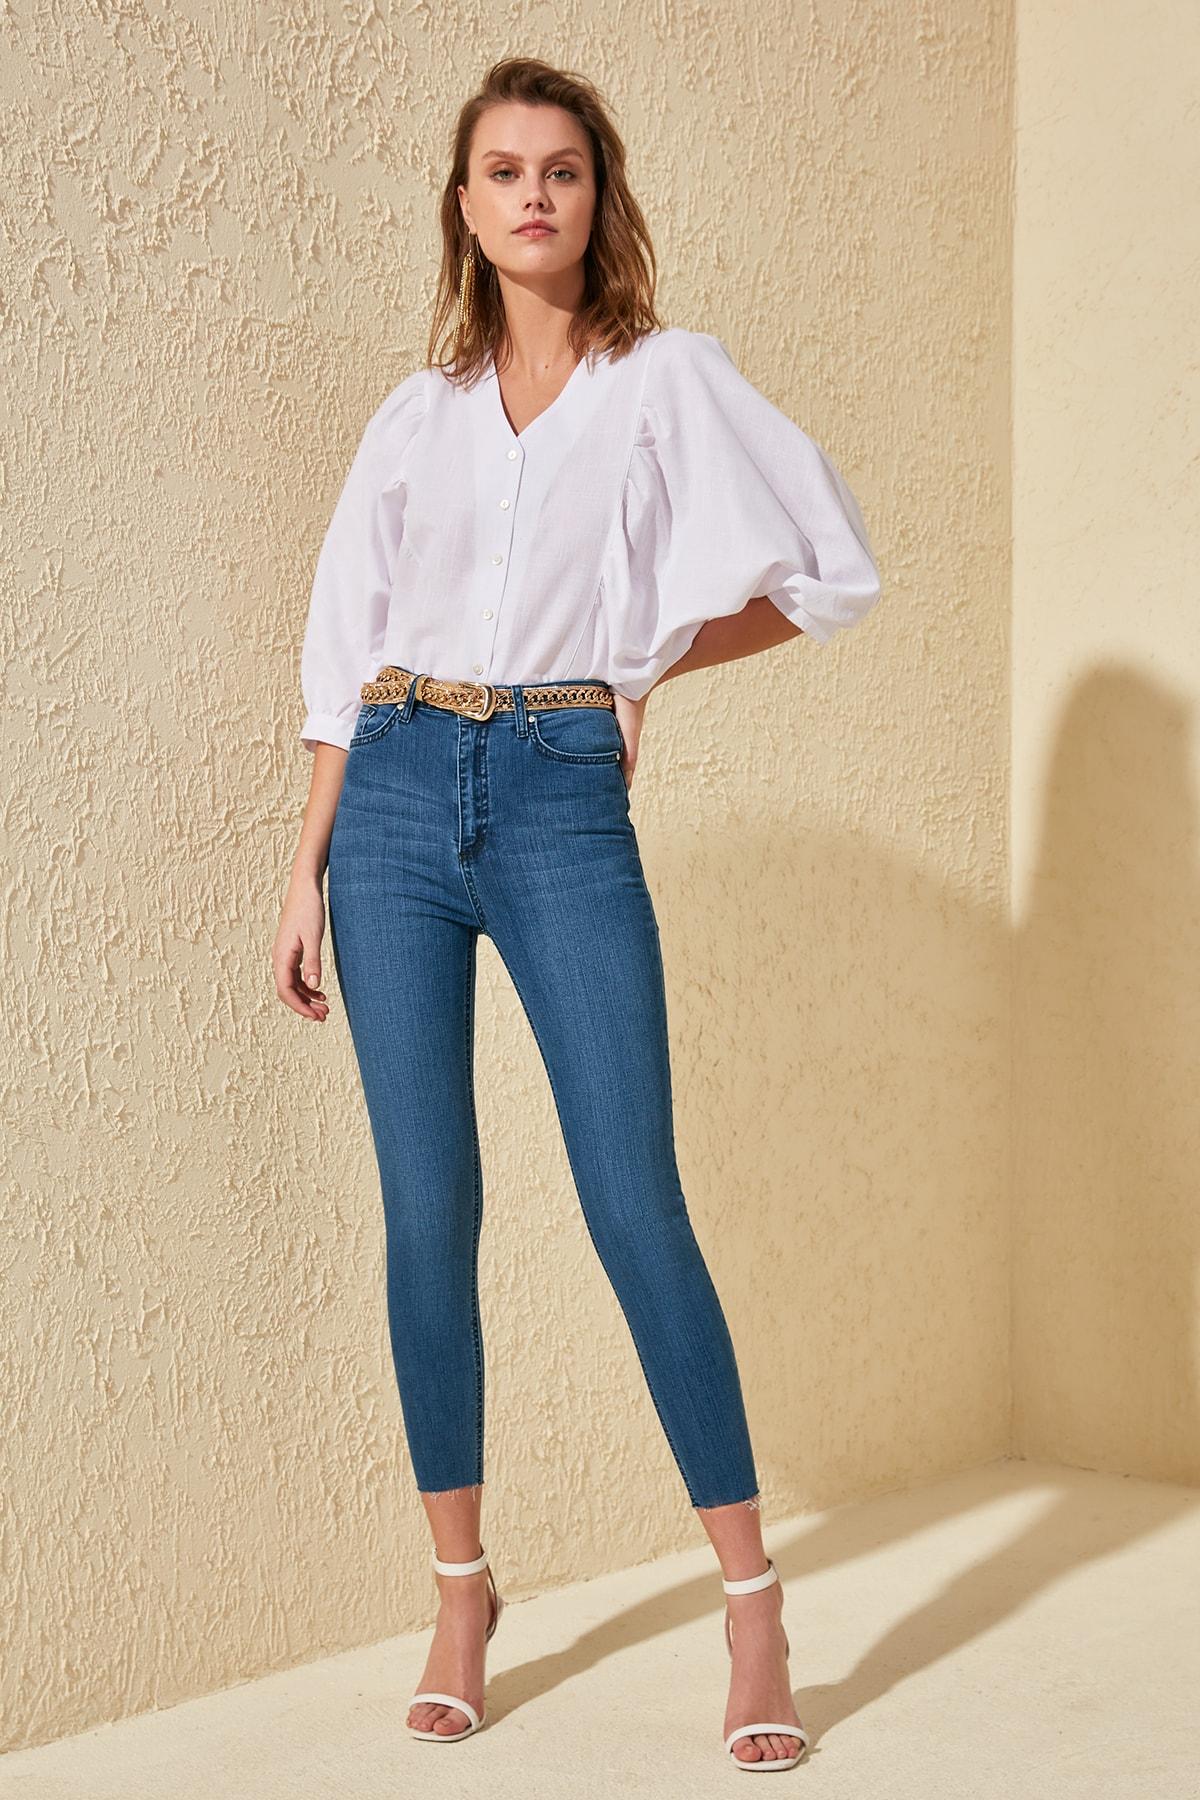 Trendyol Pettitoes Discrete High Waist Skinny Jeans TWOSS20JE0225